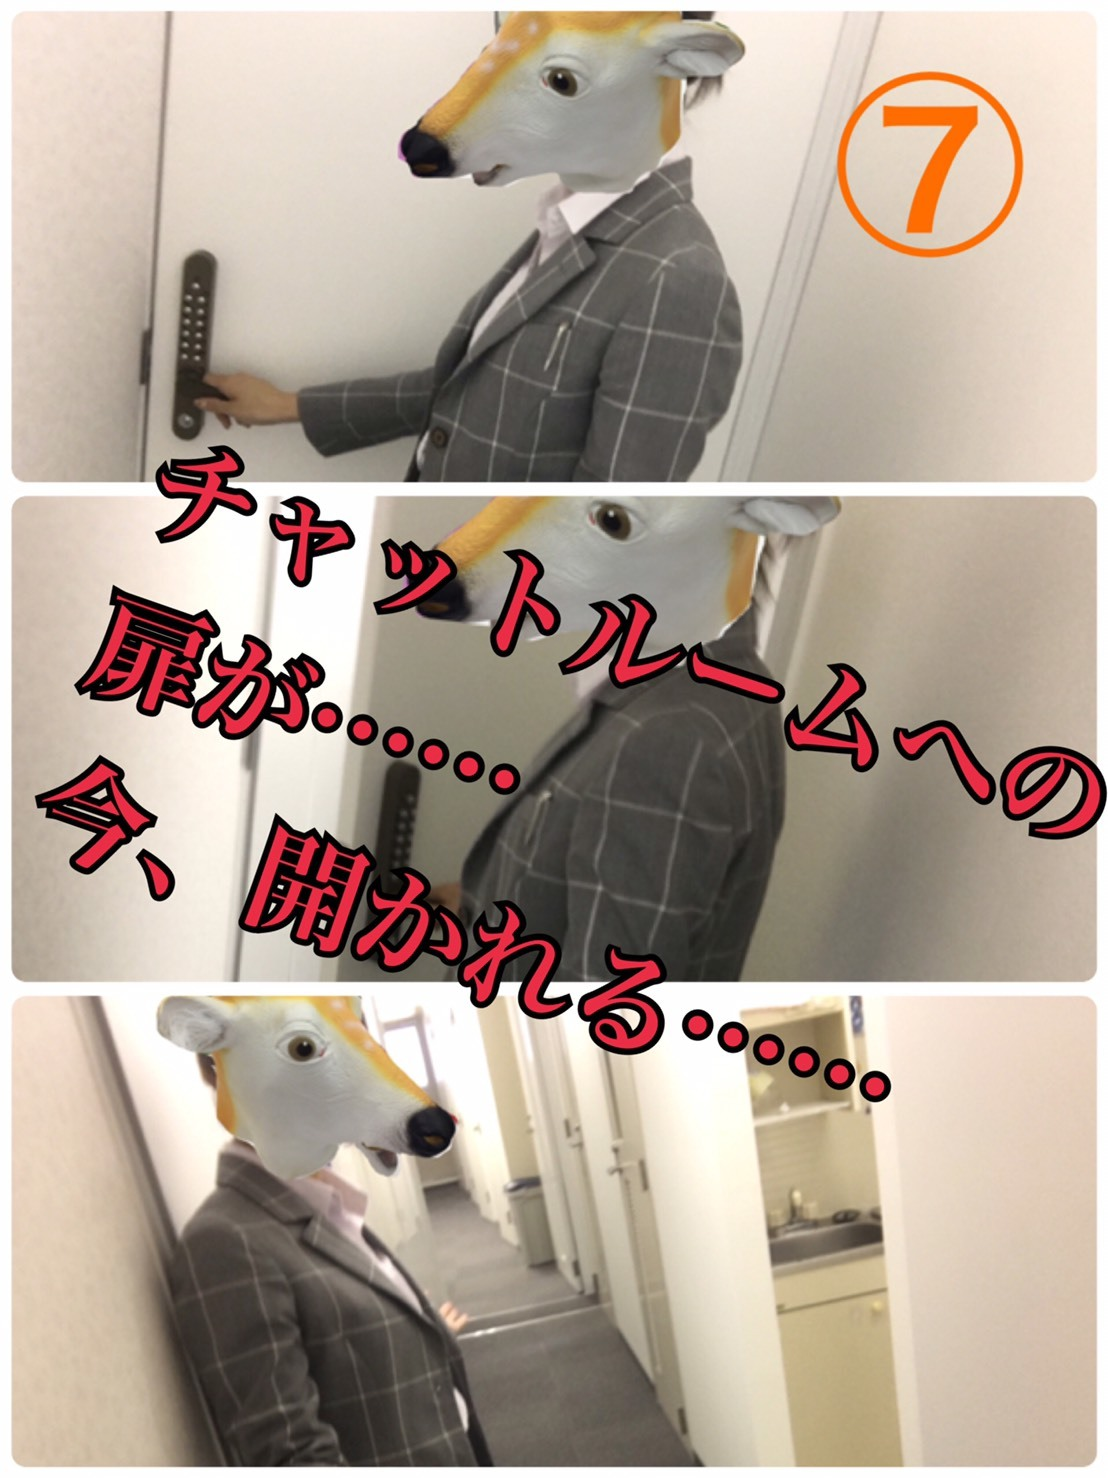 S__32448520.jpg